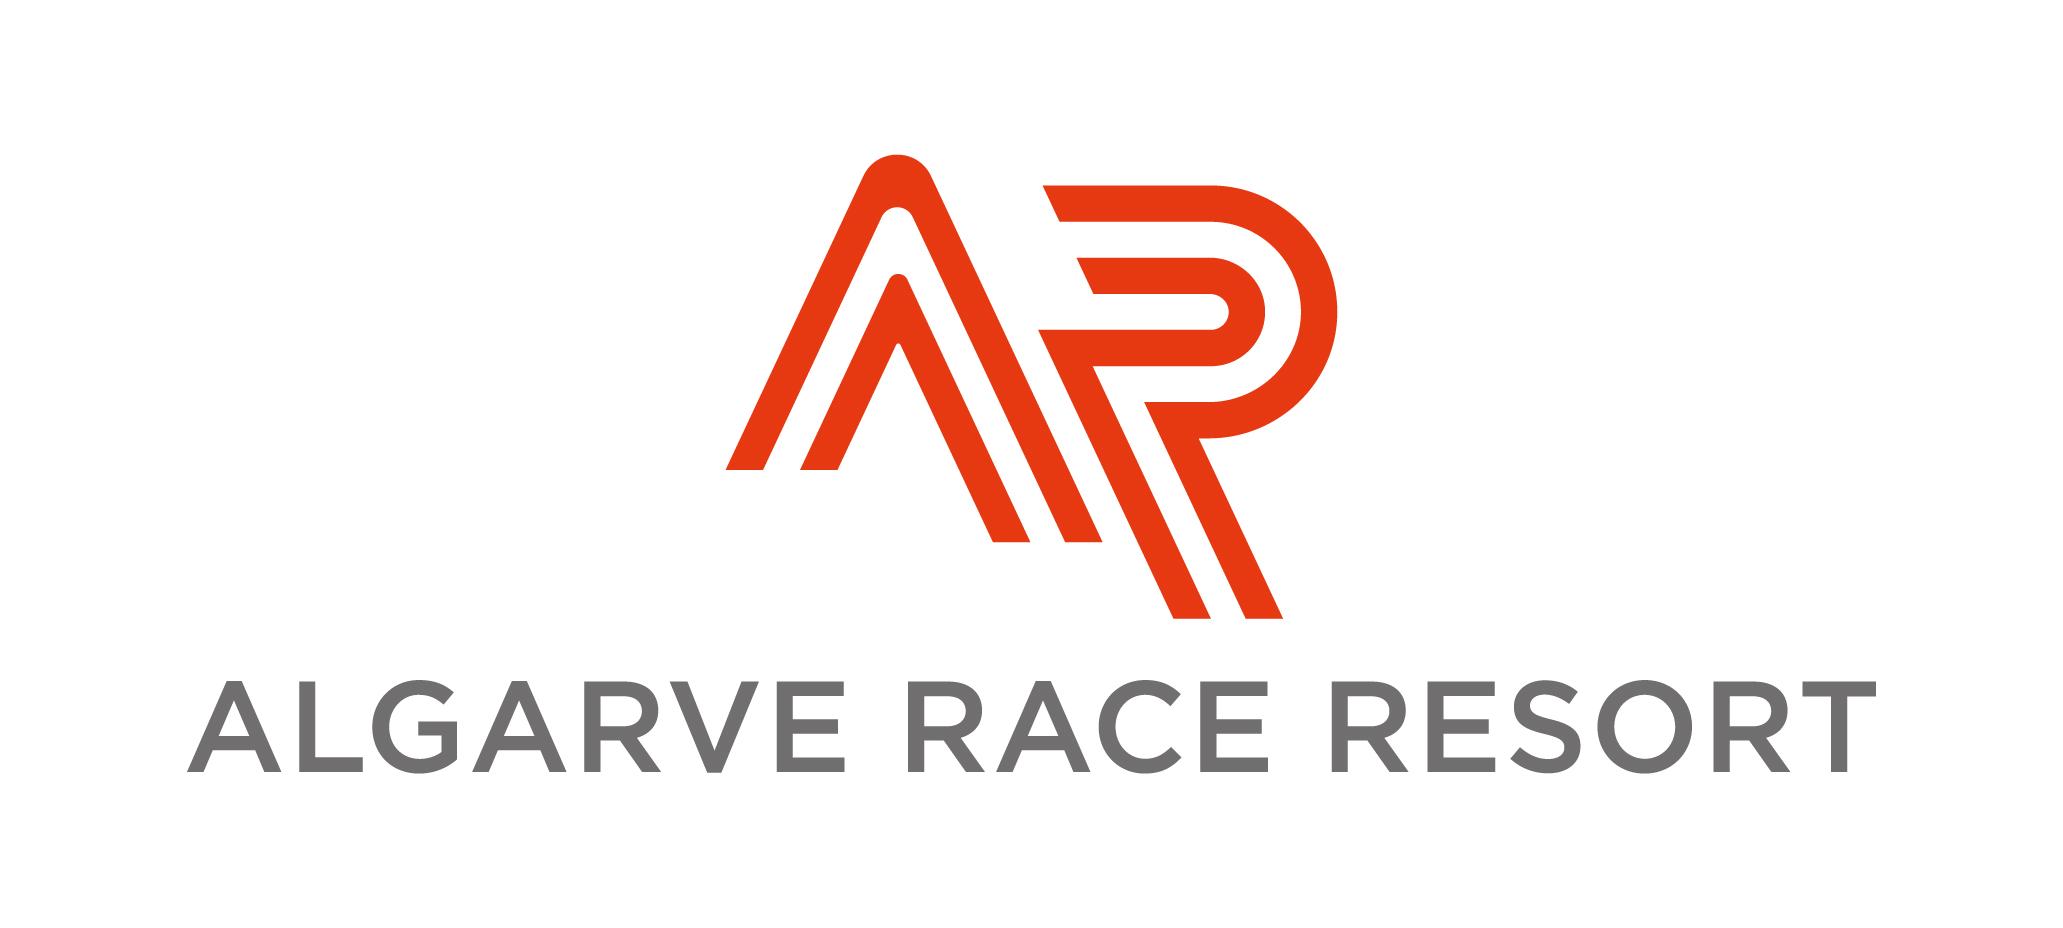 Algarve Race Resort